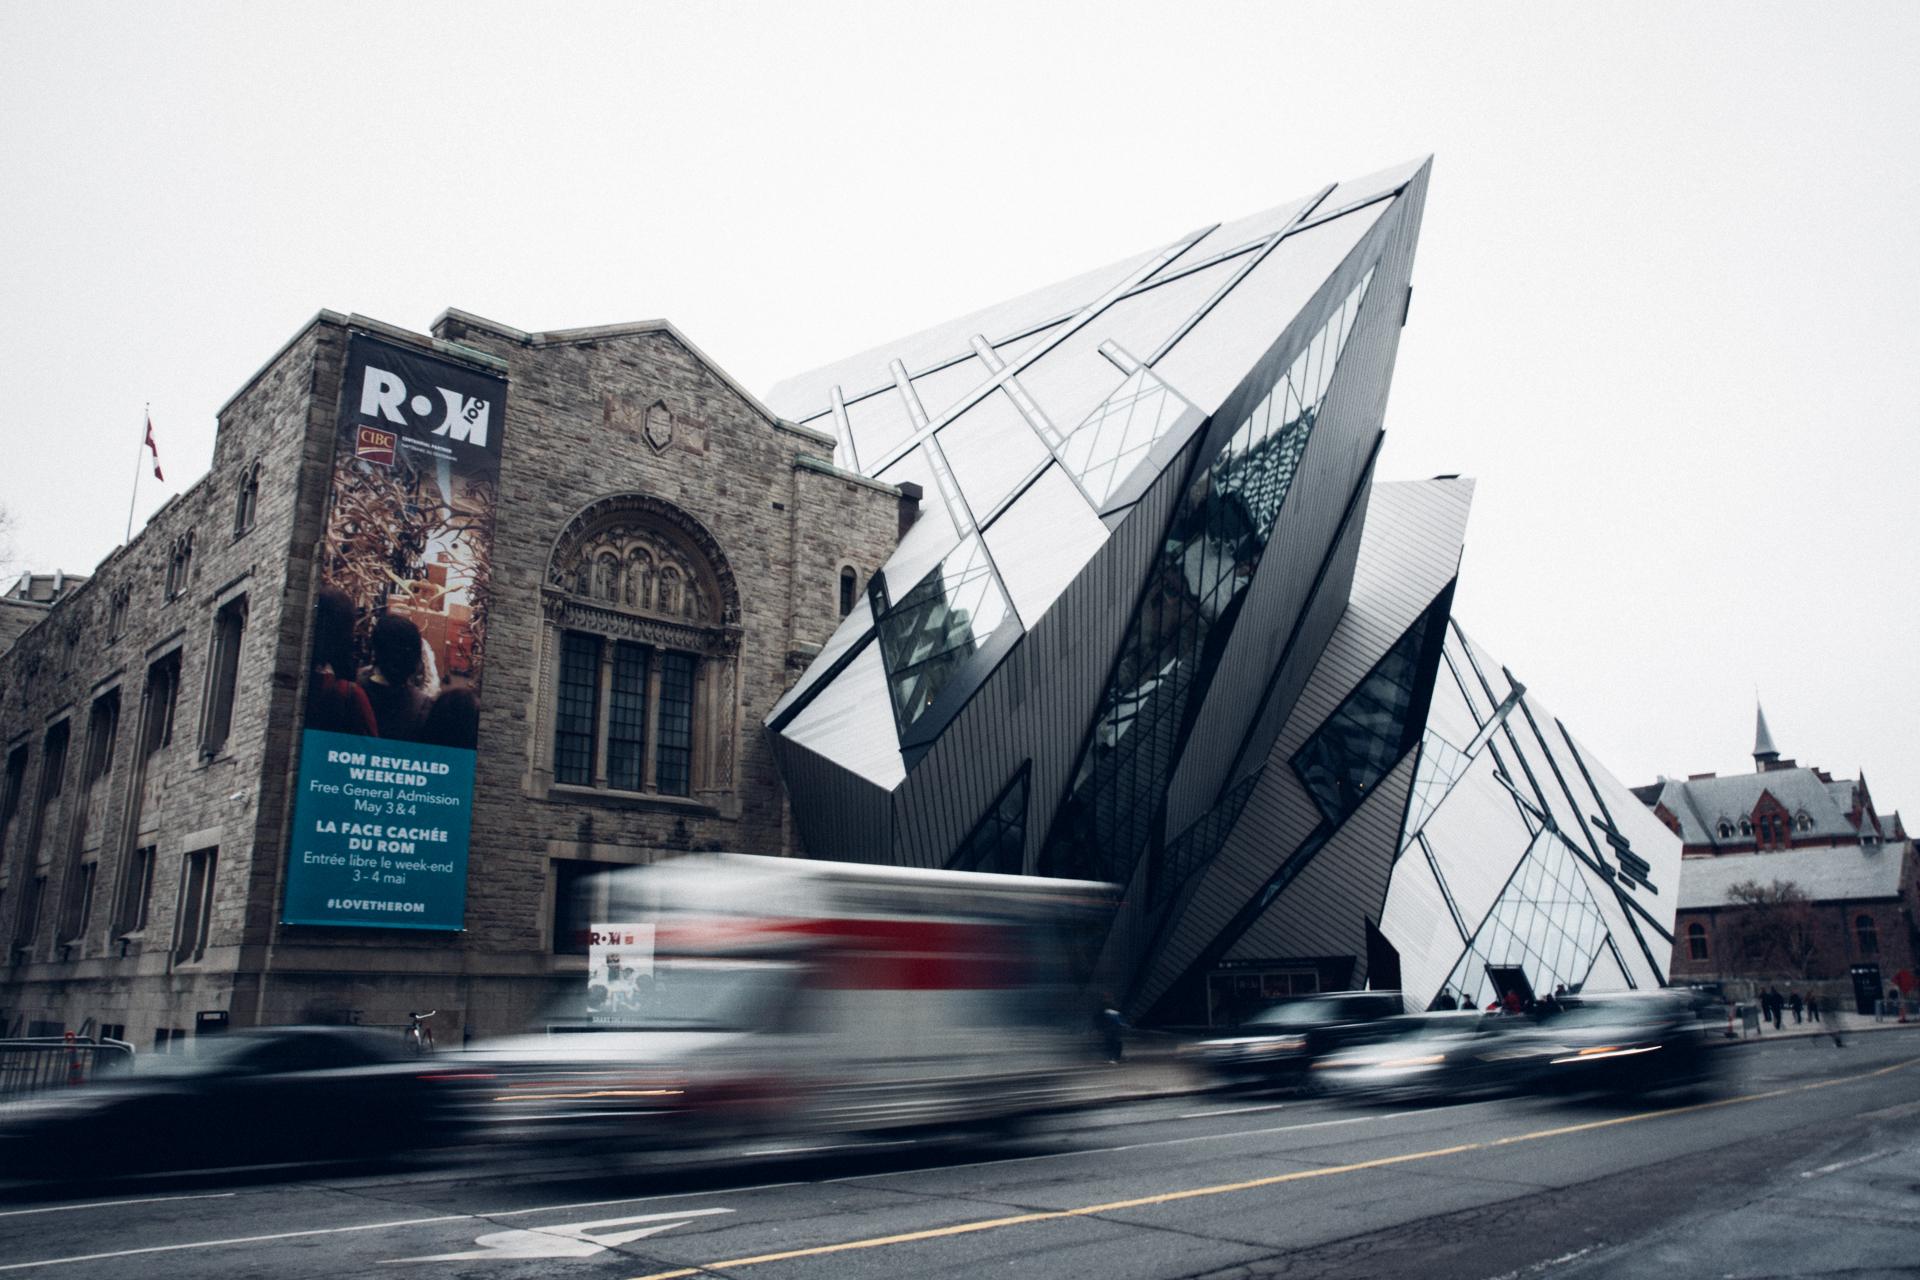 Toronto: Royal Ontario Museum - ROM Toronto by Frank Darling and John A. Pearson